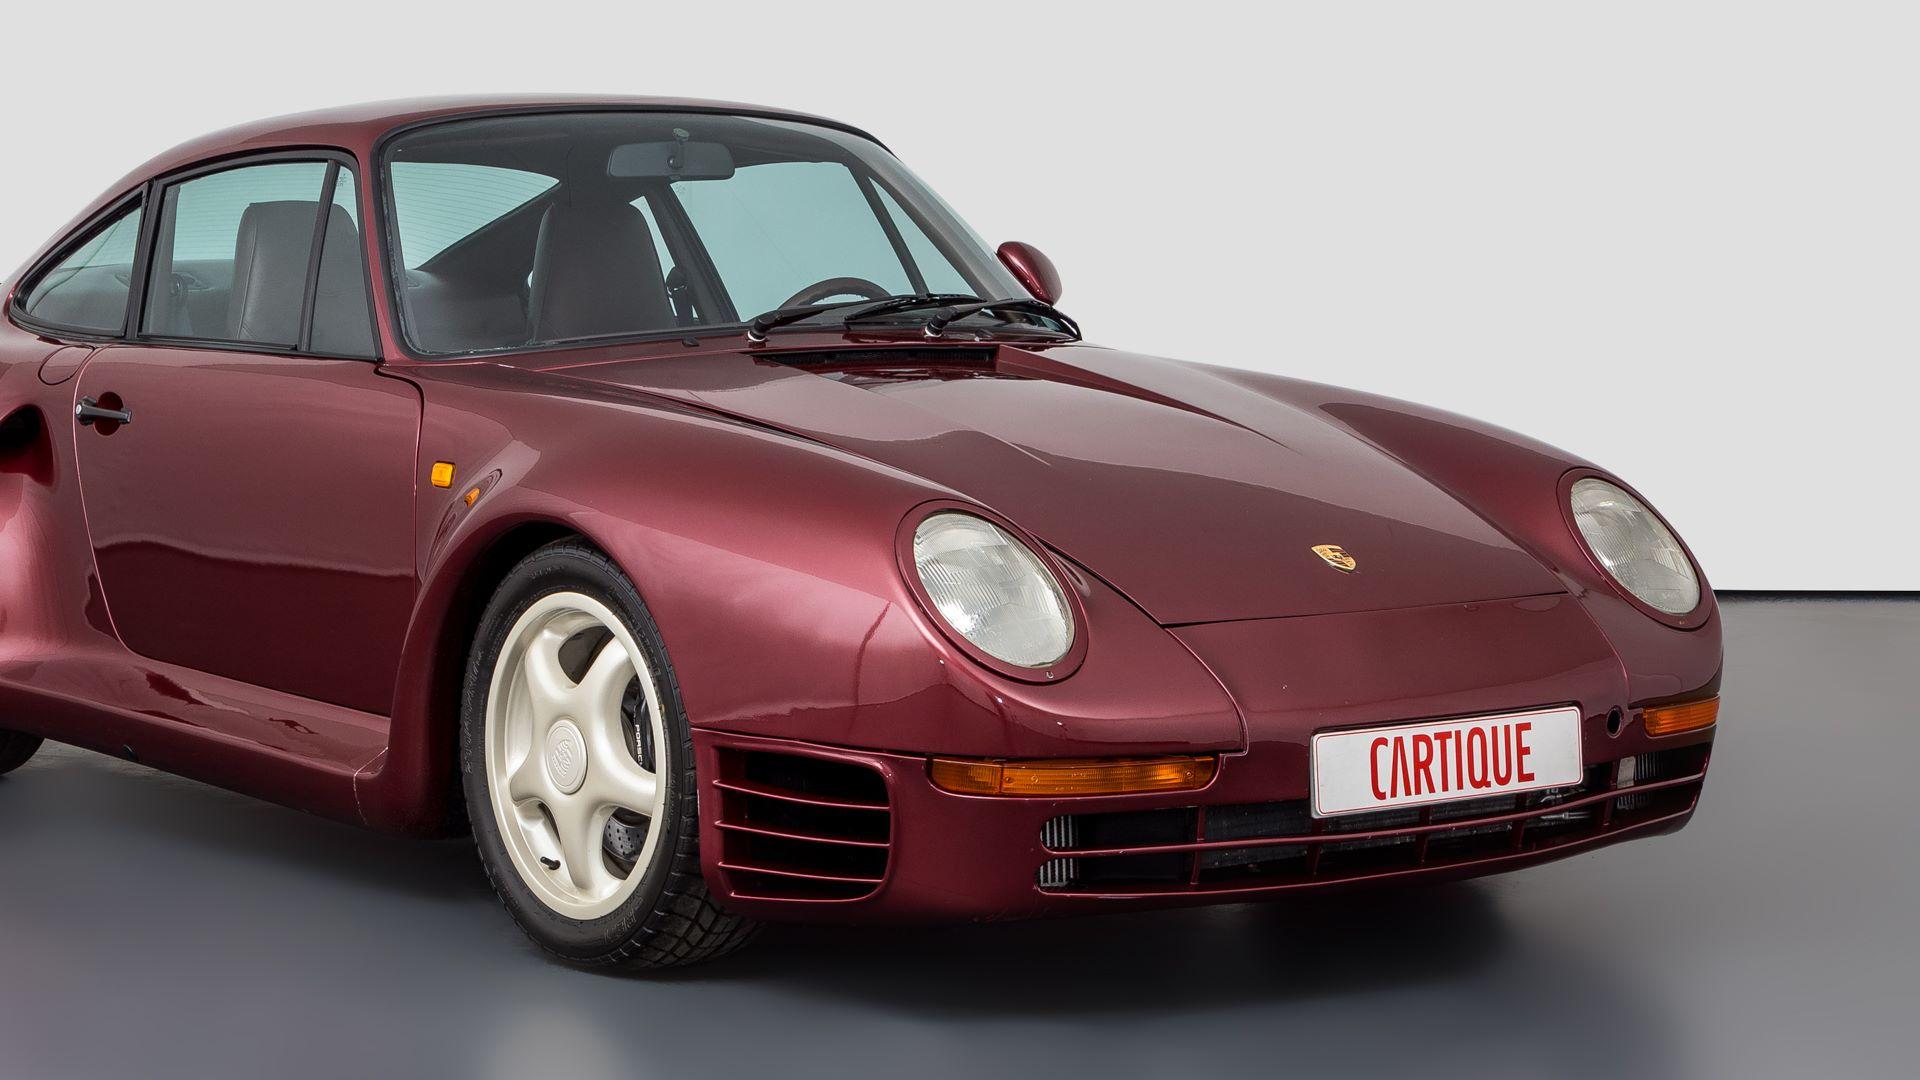 Porsche-959-Prototype-1985-for-sale-2